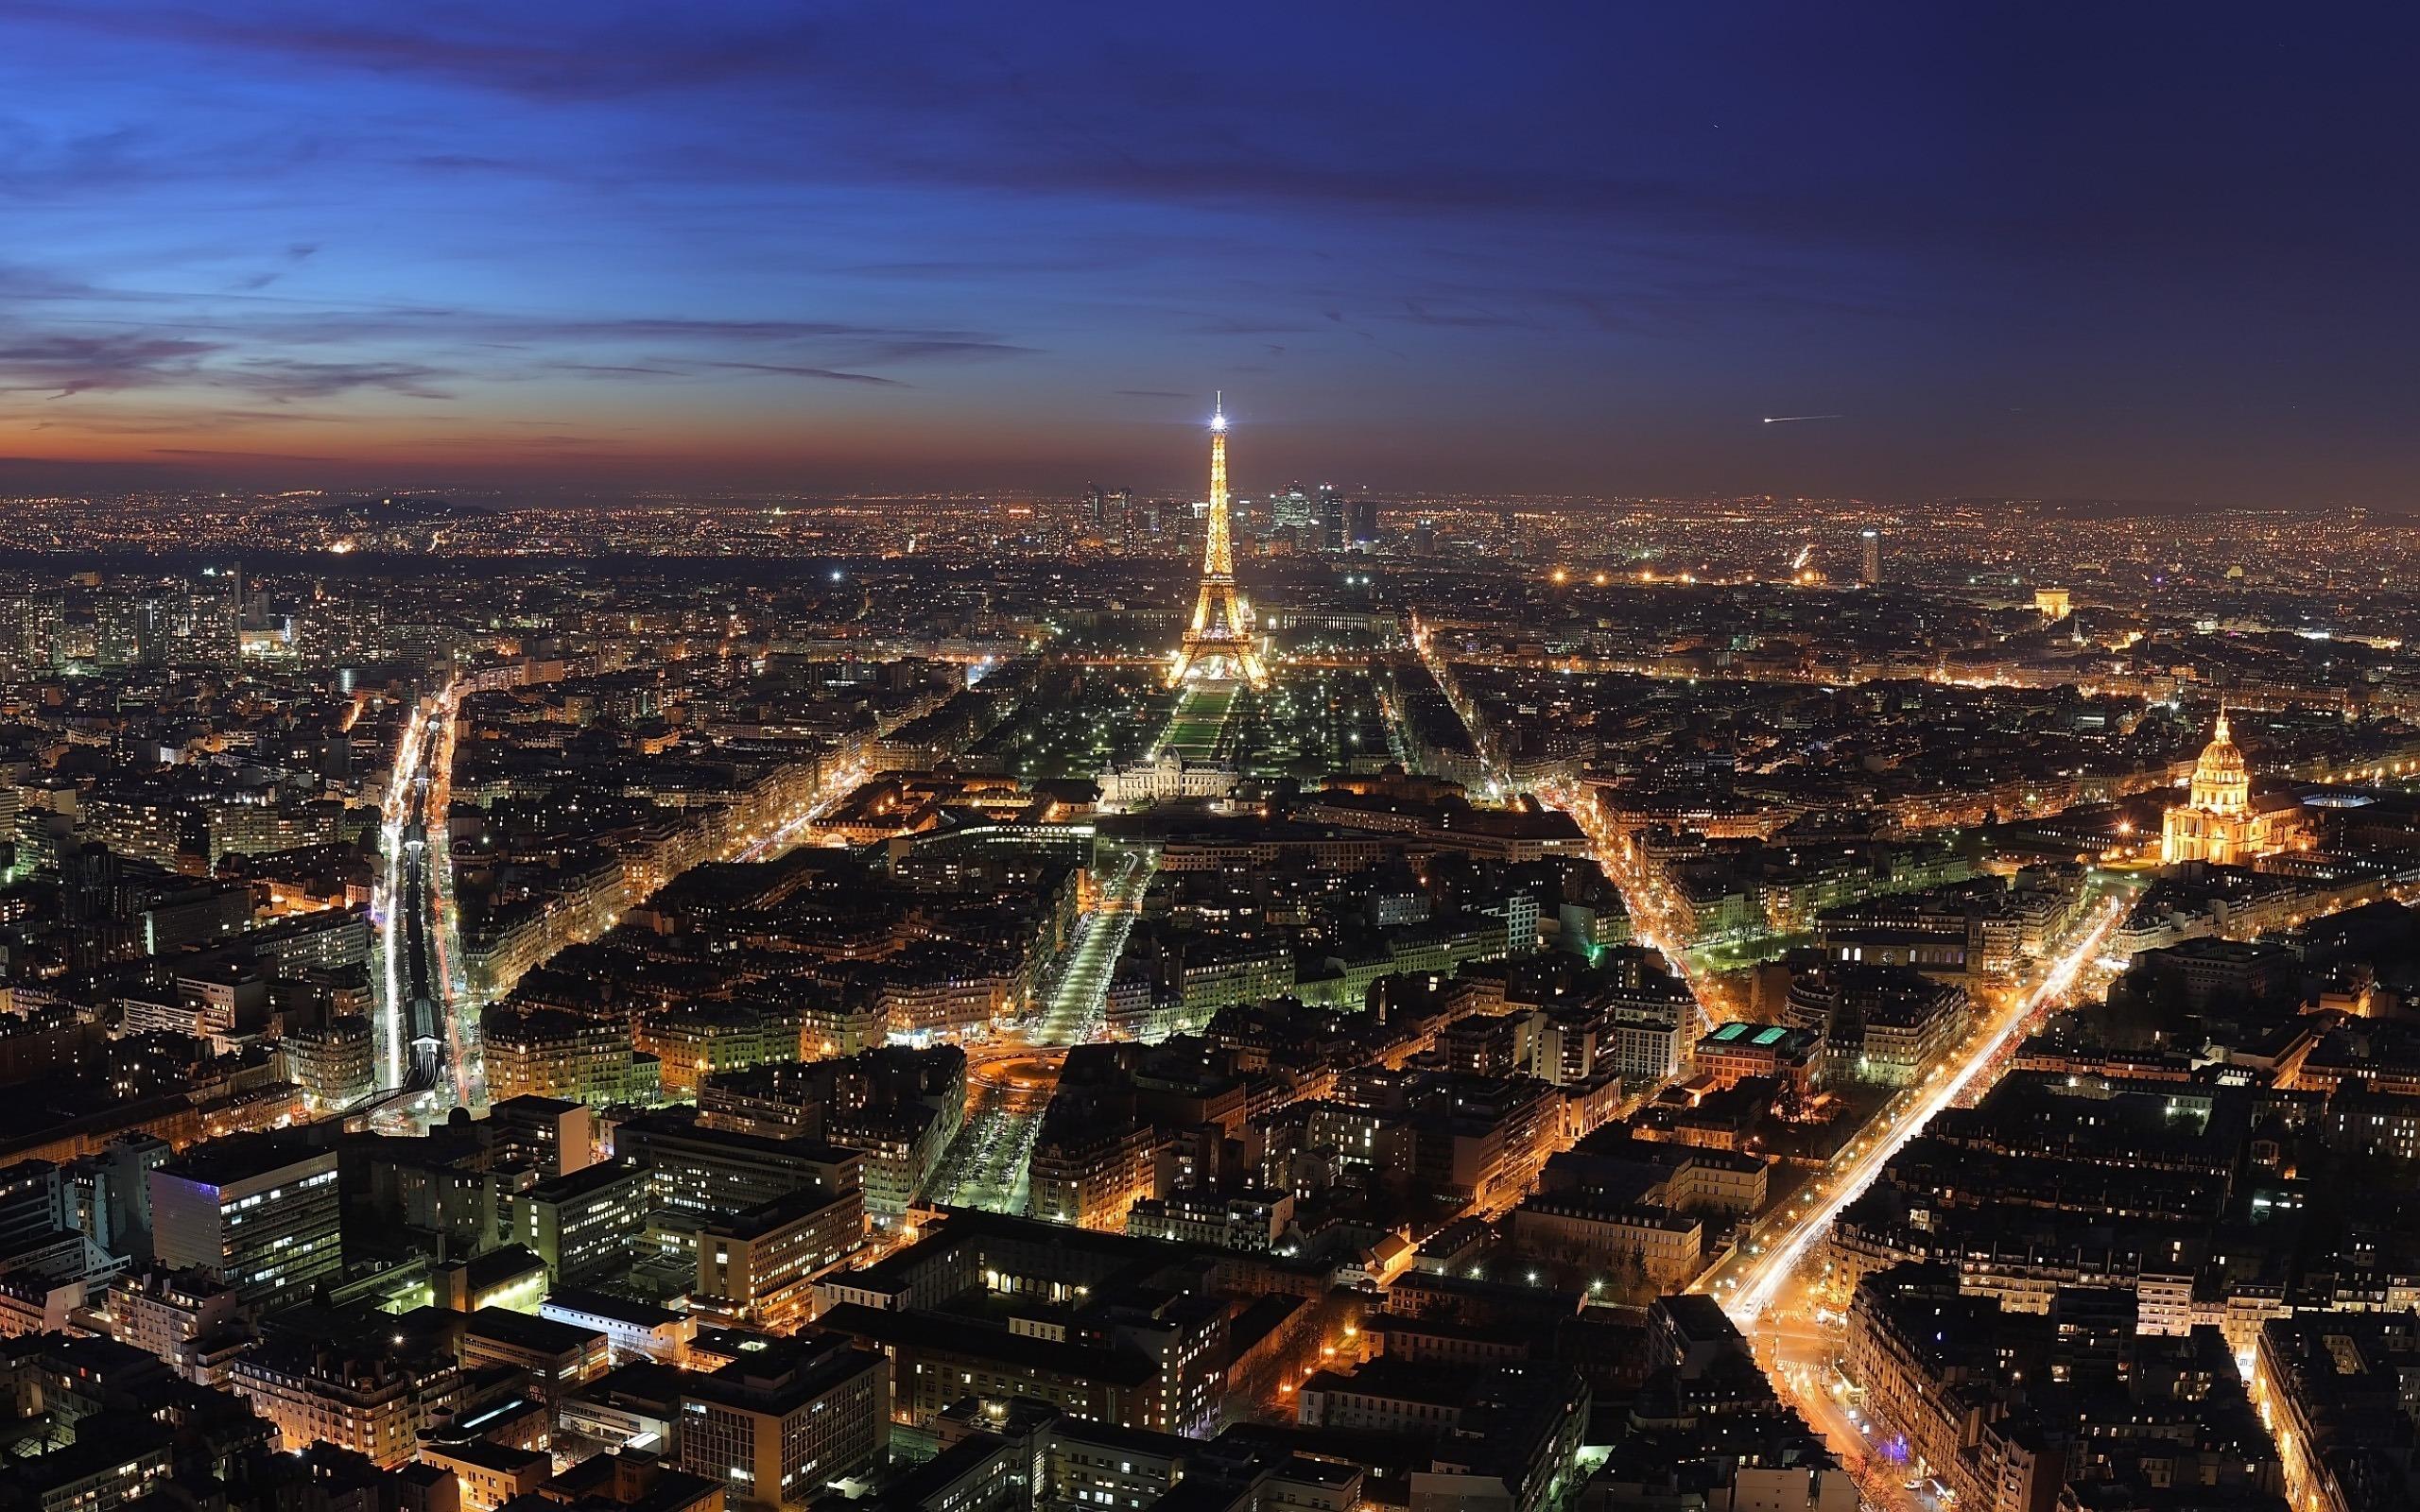 Wallpaper download paris - Paris Wallpaper France World